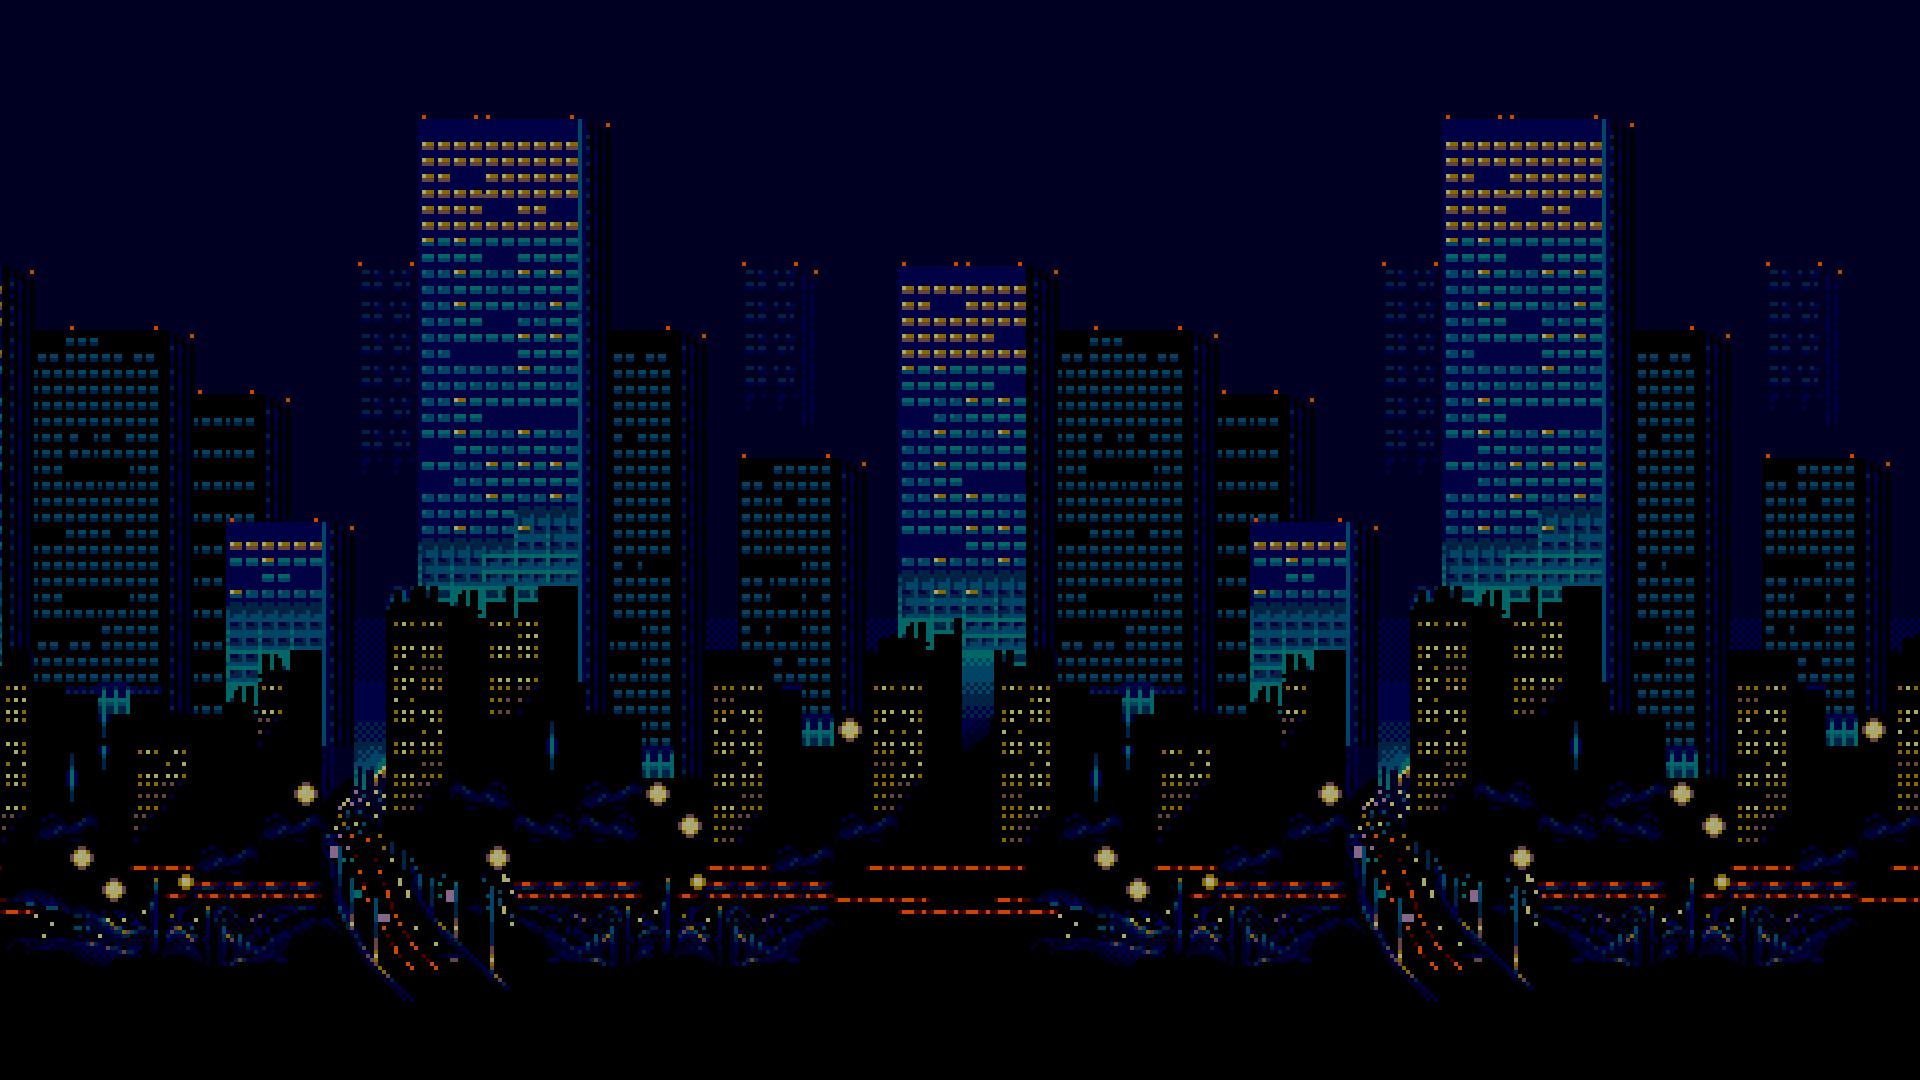 City Cityscape Night Pixel Art Urban Skyline Skyscraper 16 Bit Horizon Metropolis Sega Streets Of Rage